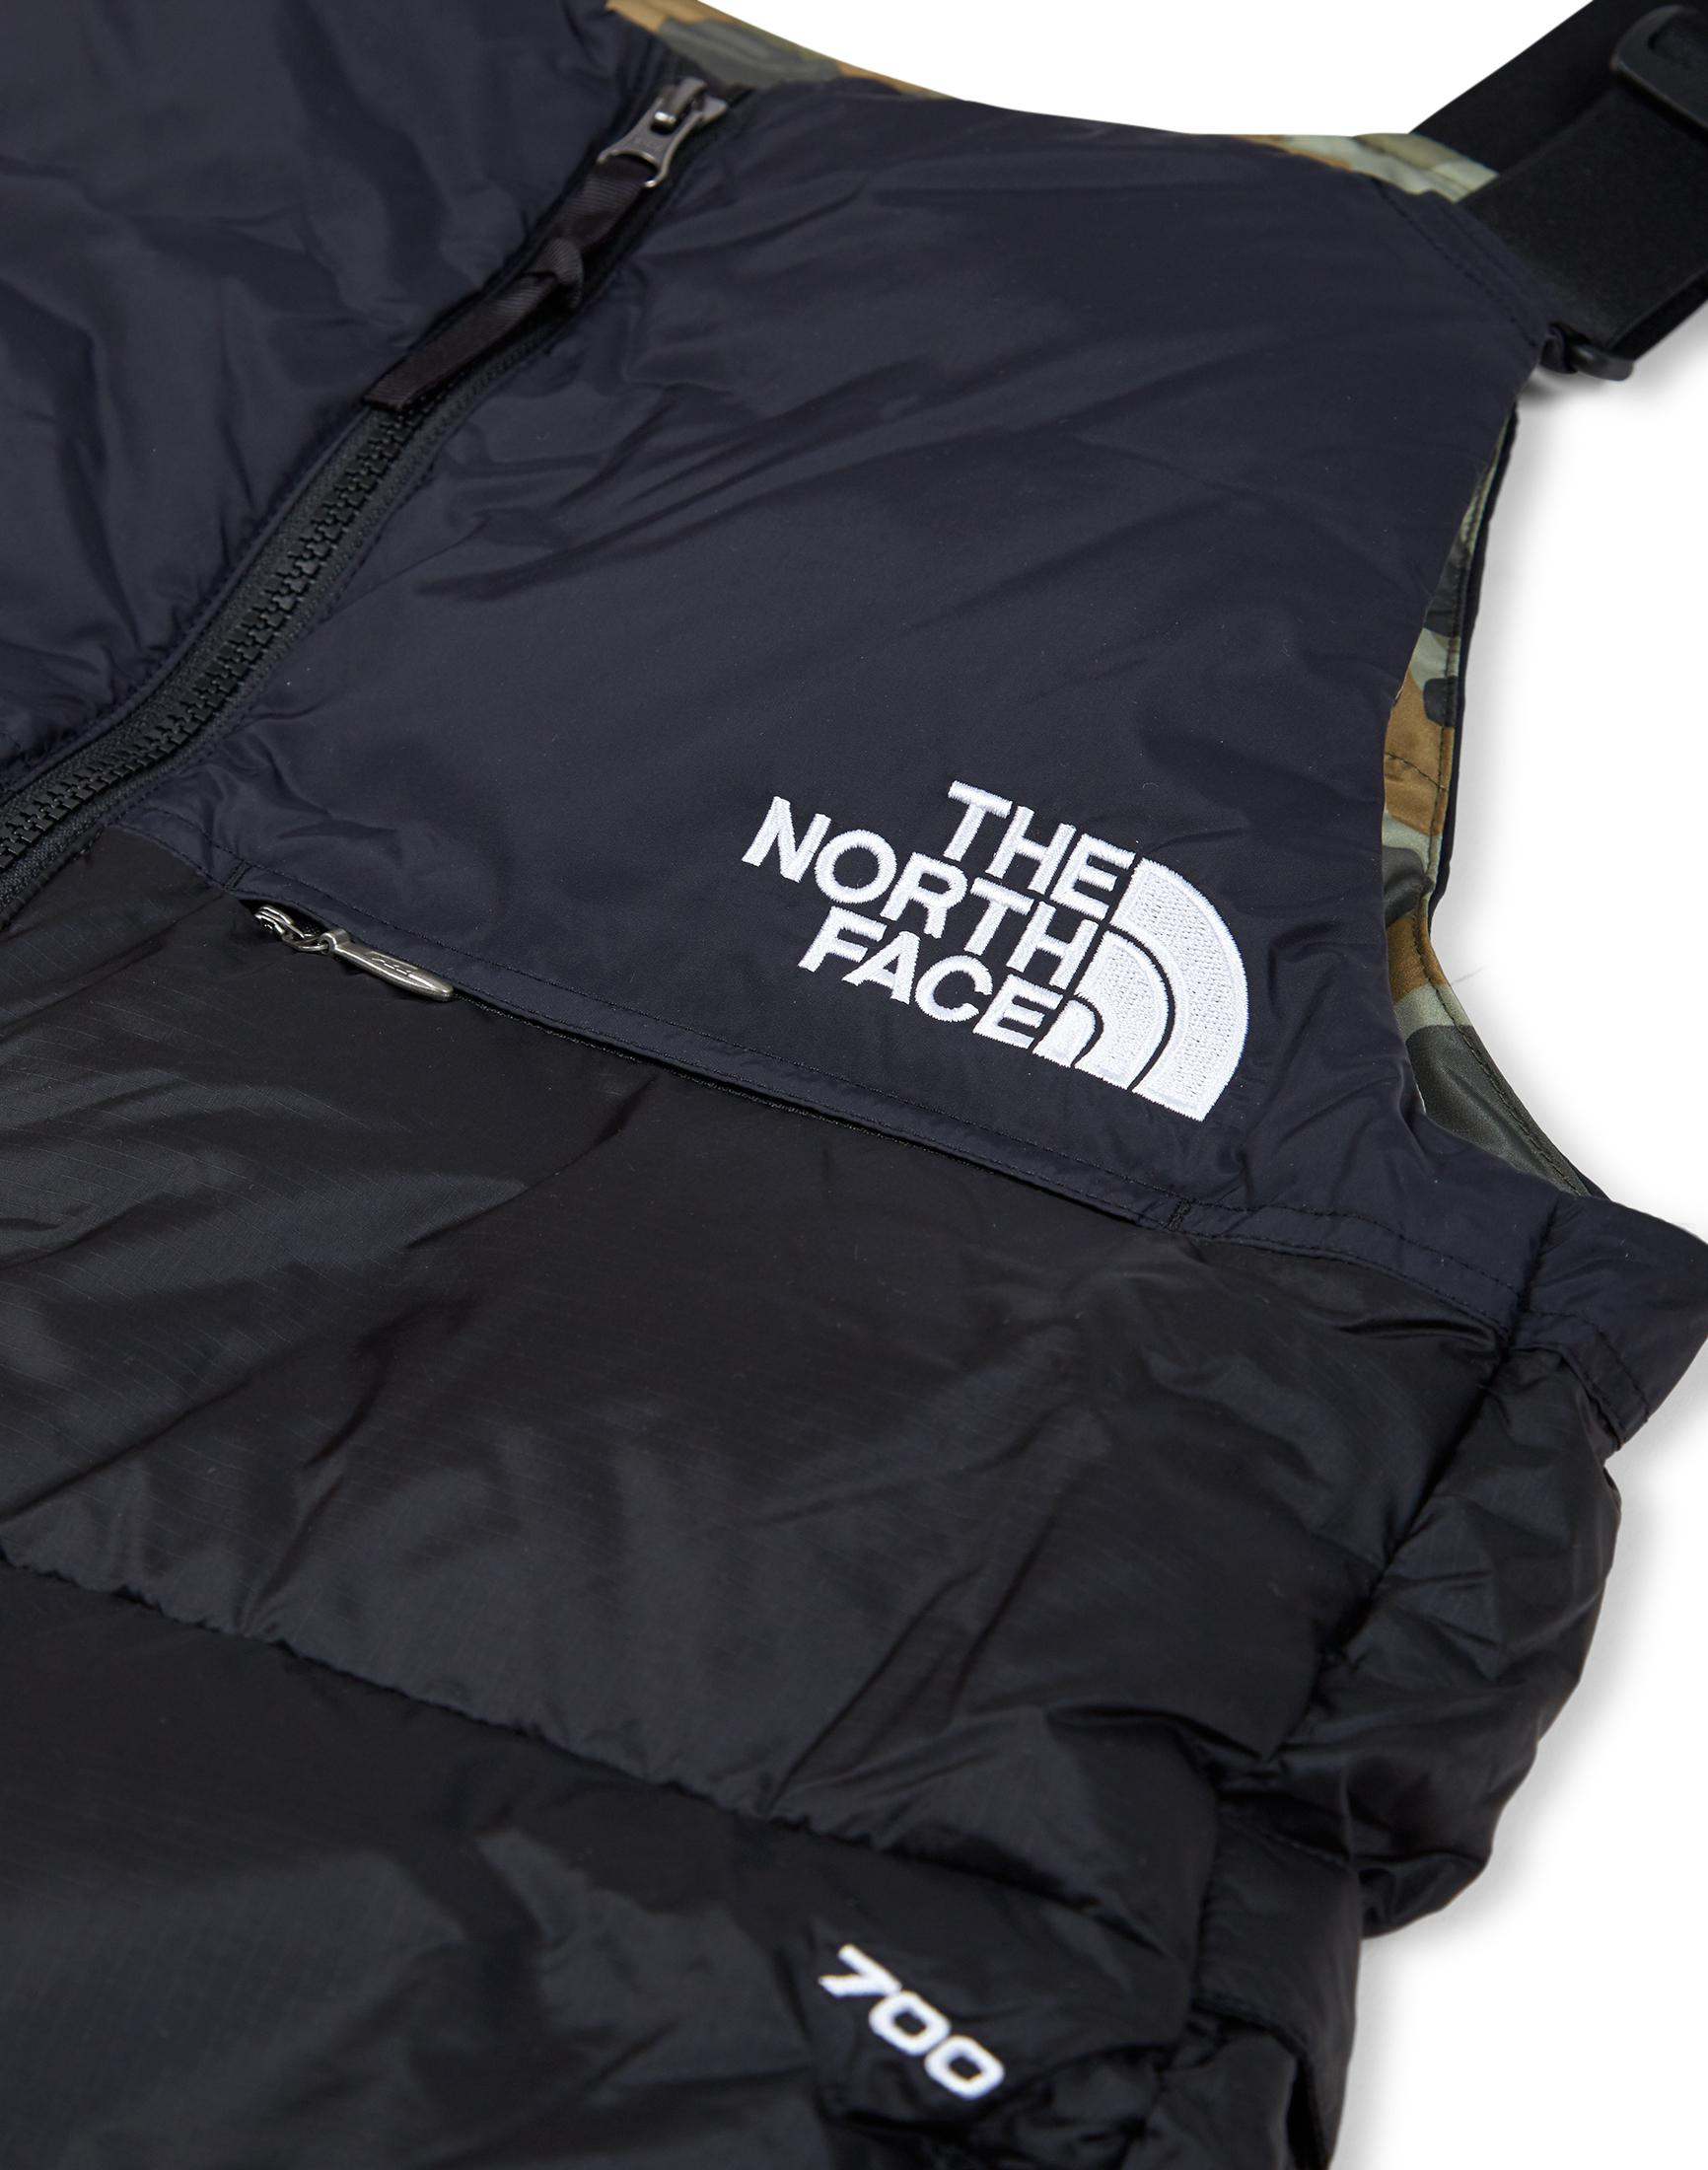 dbfb6c09c4 ... The North Face Nuptse Bib Black in Black for Men - Lyst brand new 75792  8304f ...